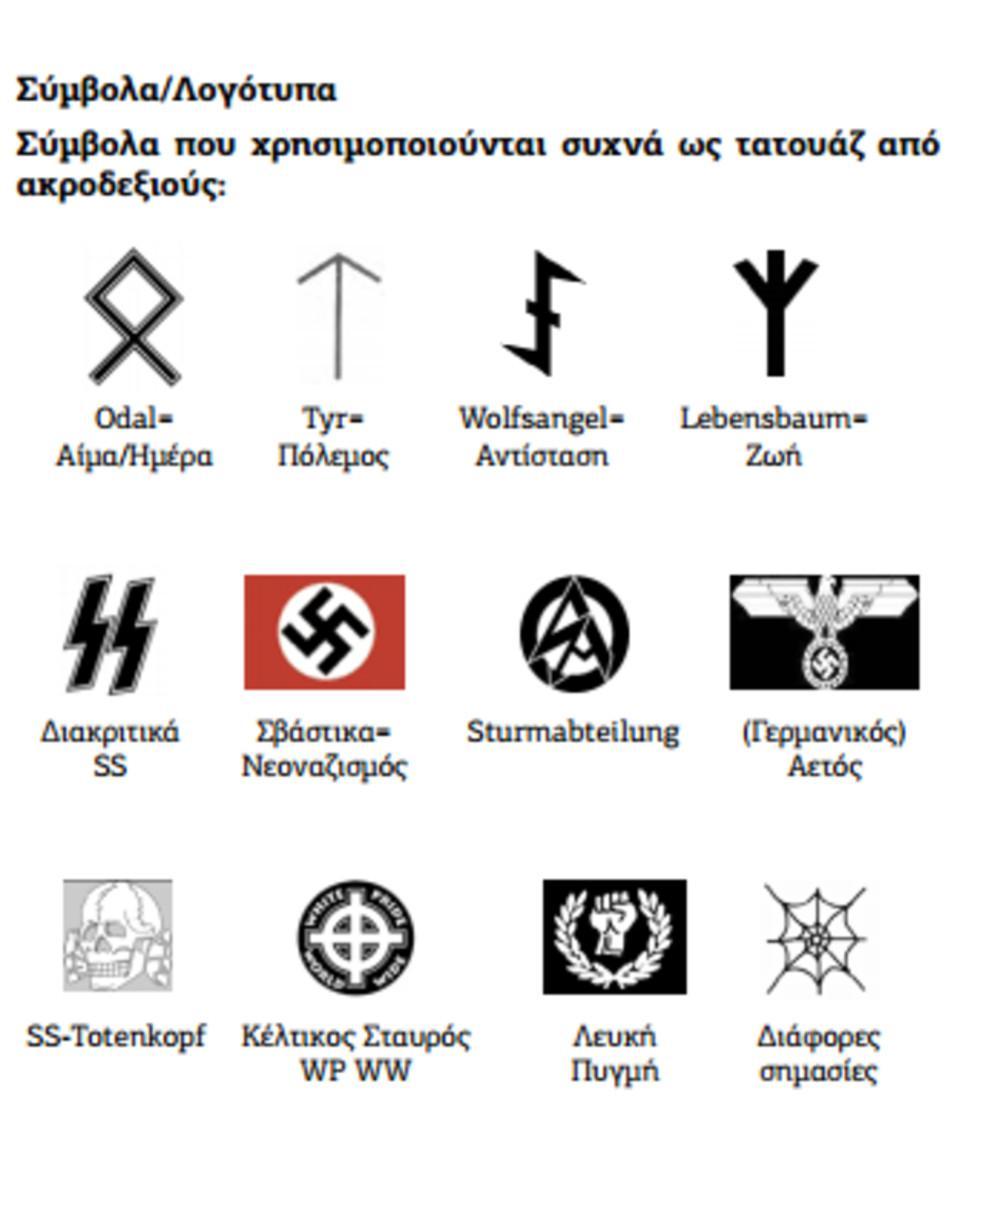 orgranoseis-akrodeksia Τατουάζ και σύμβολα που «δείχνουν» ακροδεξιά ιδεολογία, στο εγχειρίδιο της ΕΛΑΣ [εικόνες]